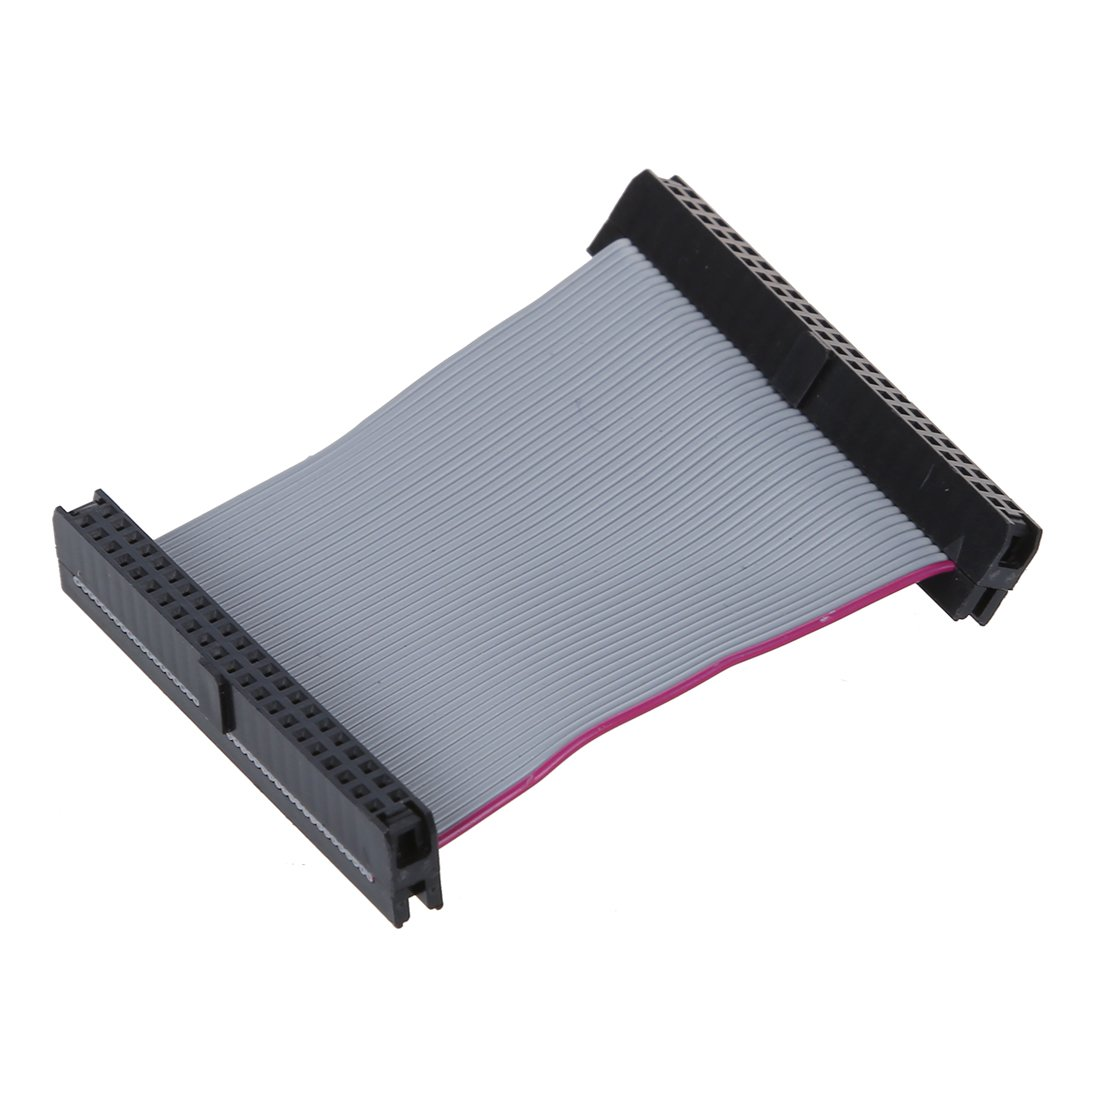 CUHAWUDBA 2-inch 44-pin female 2.5-inch IDE Hard Drive Cable